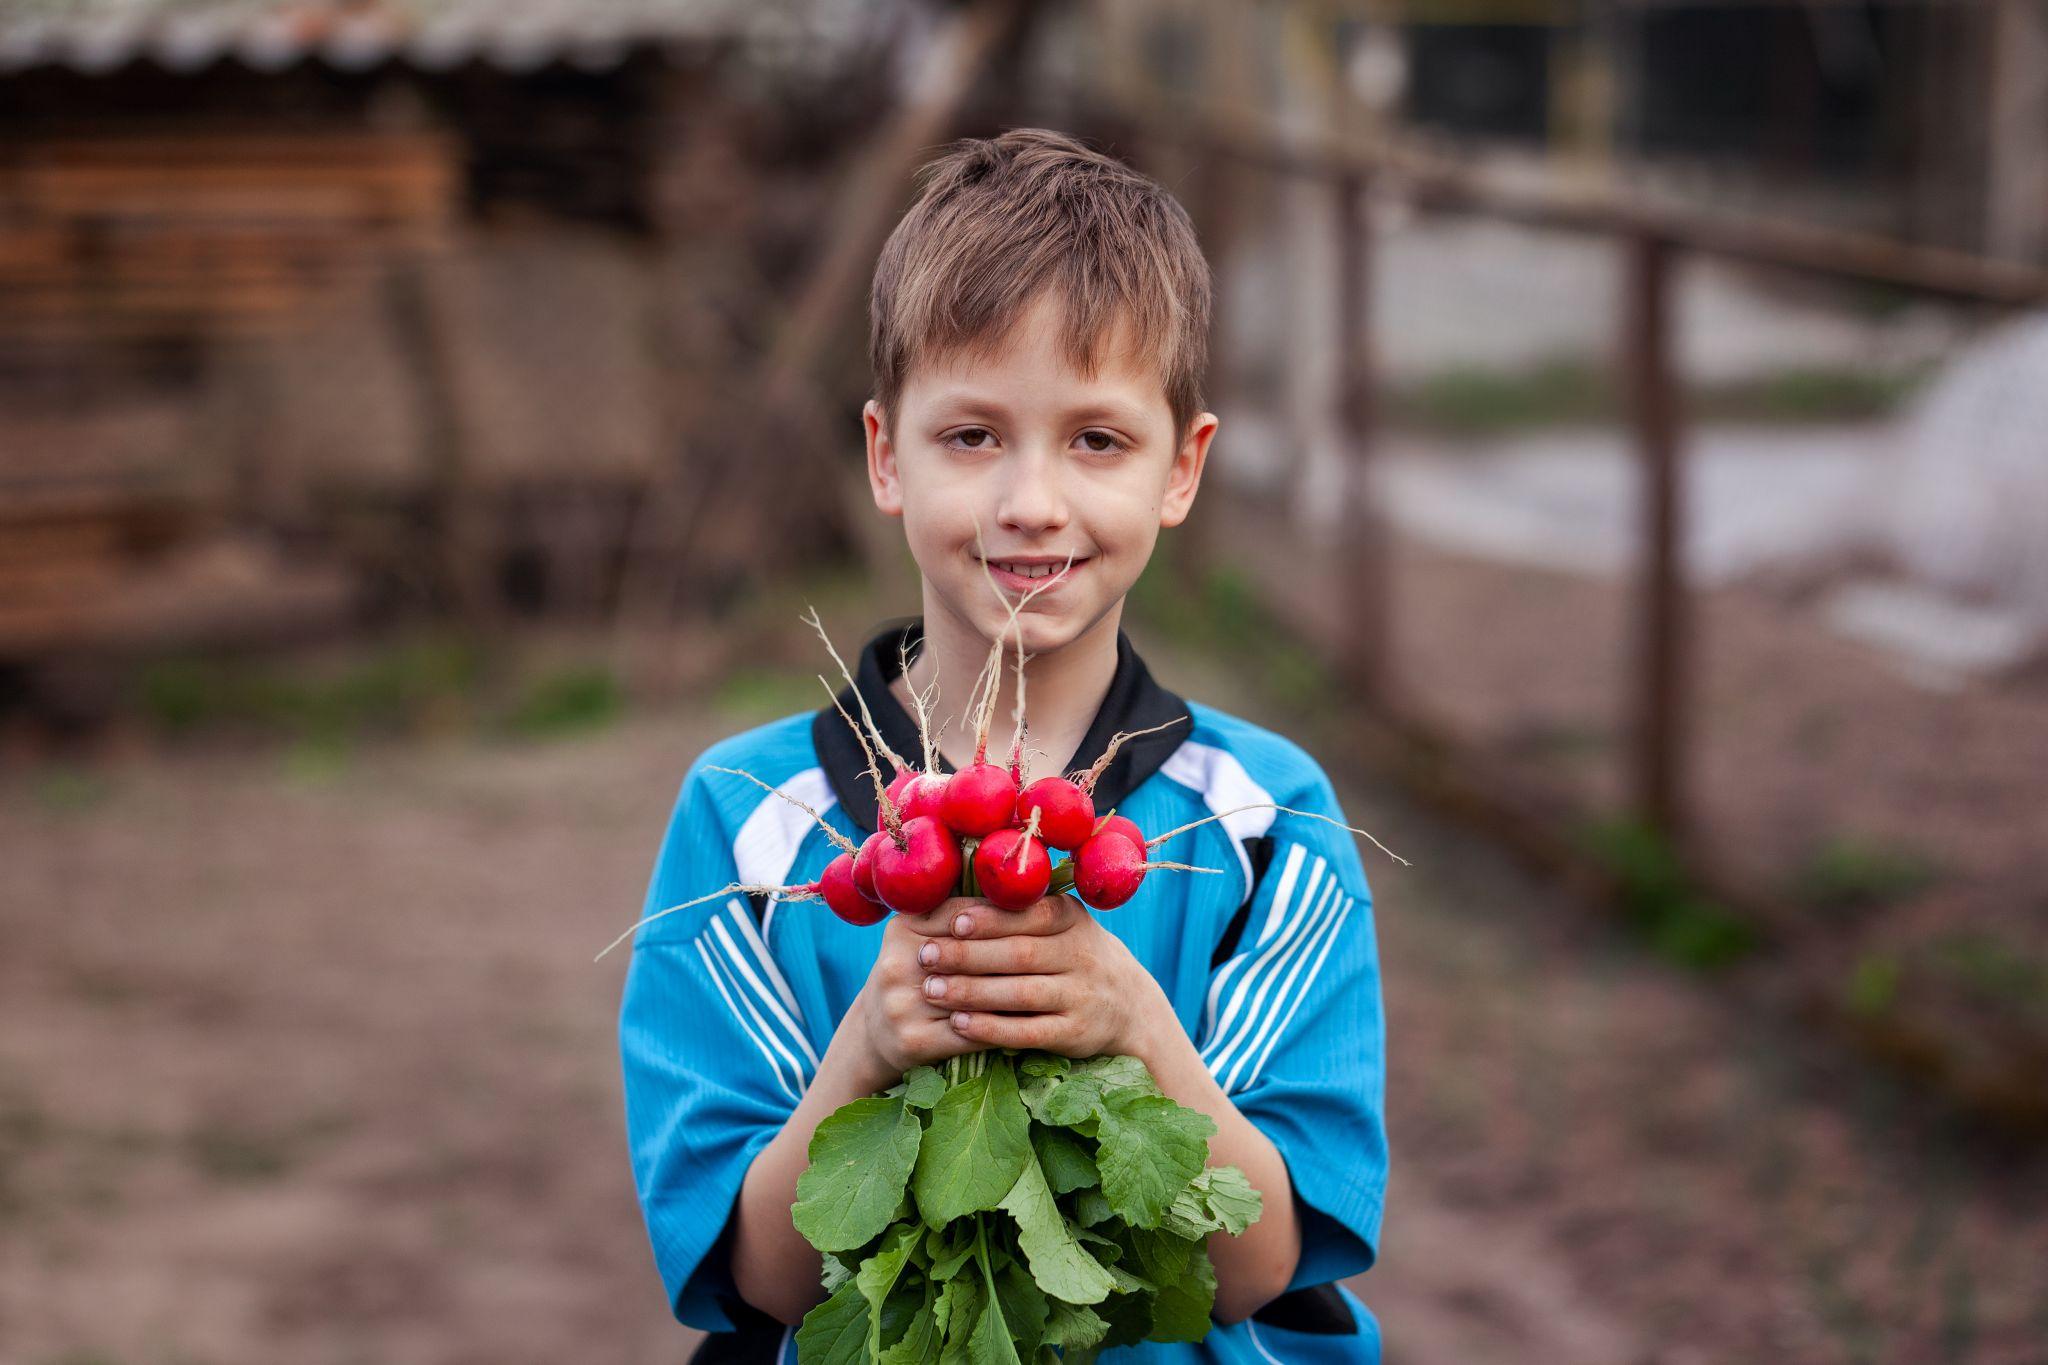 Green Thumb Gardening Activities - Picniq Blog